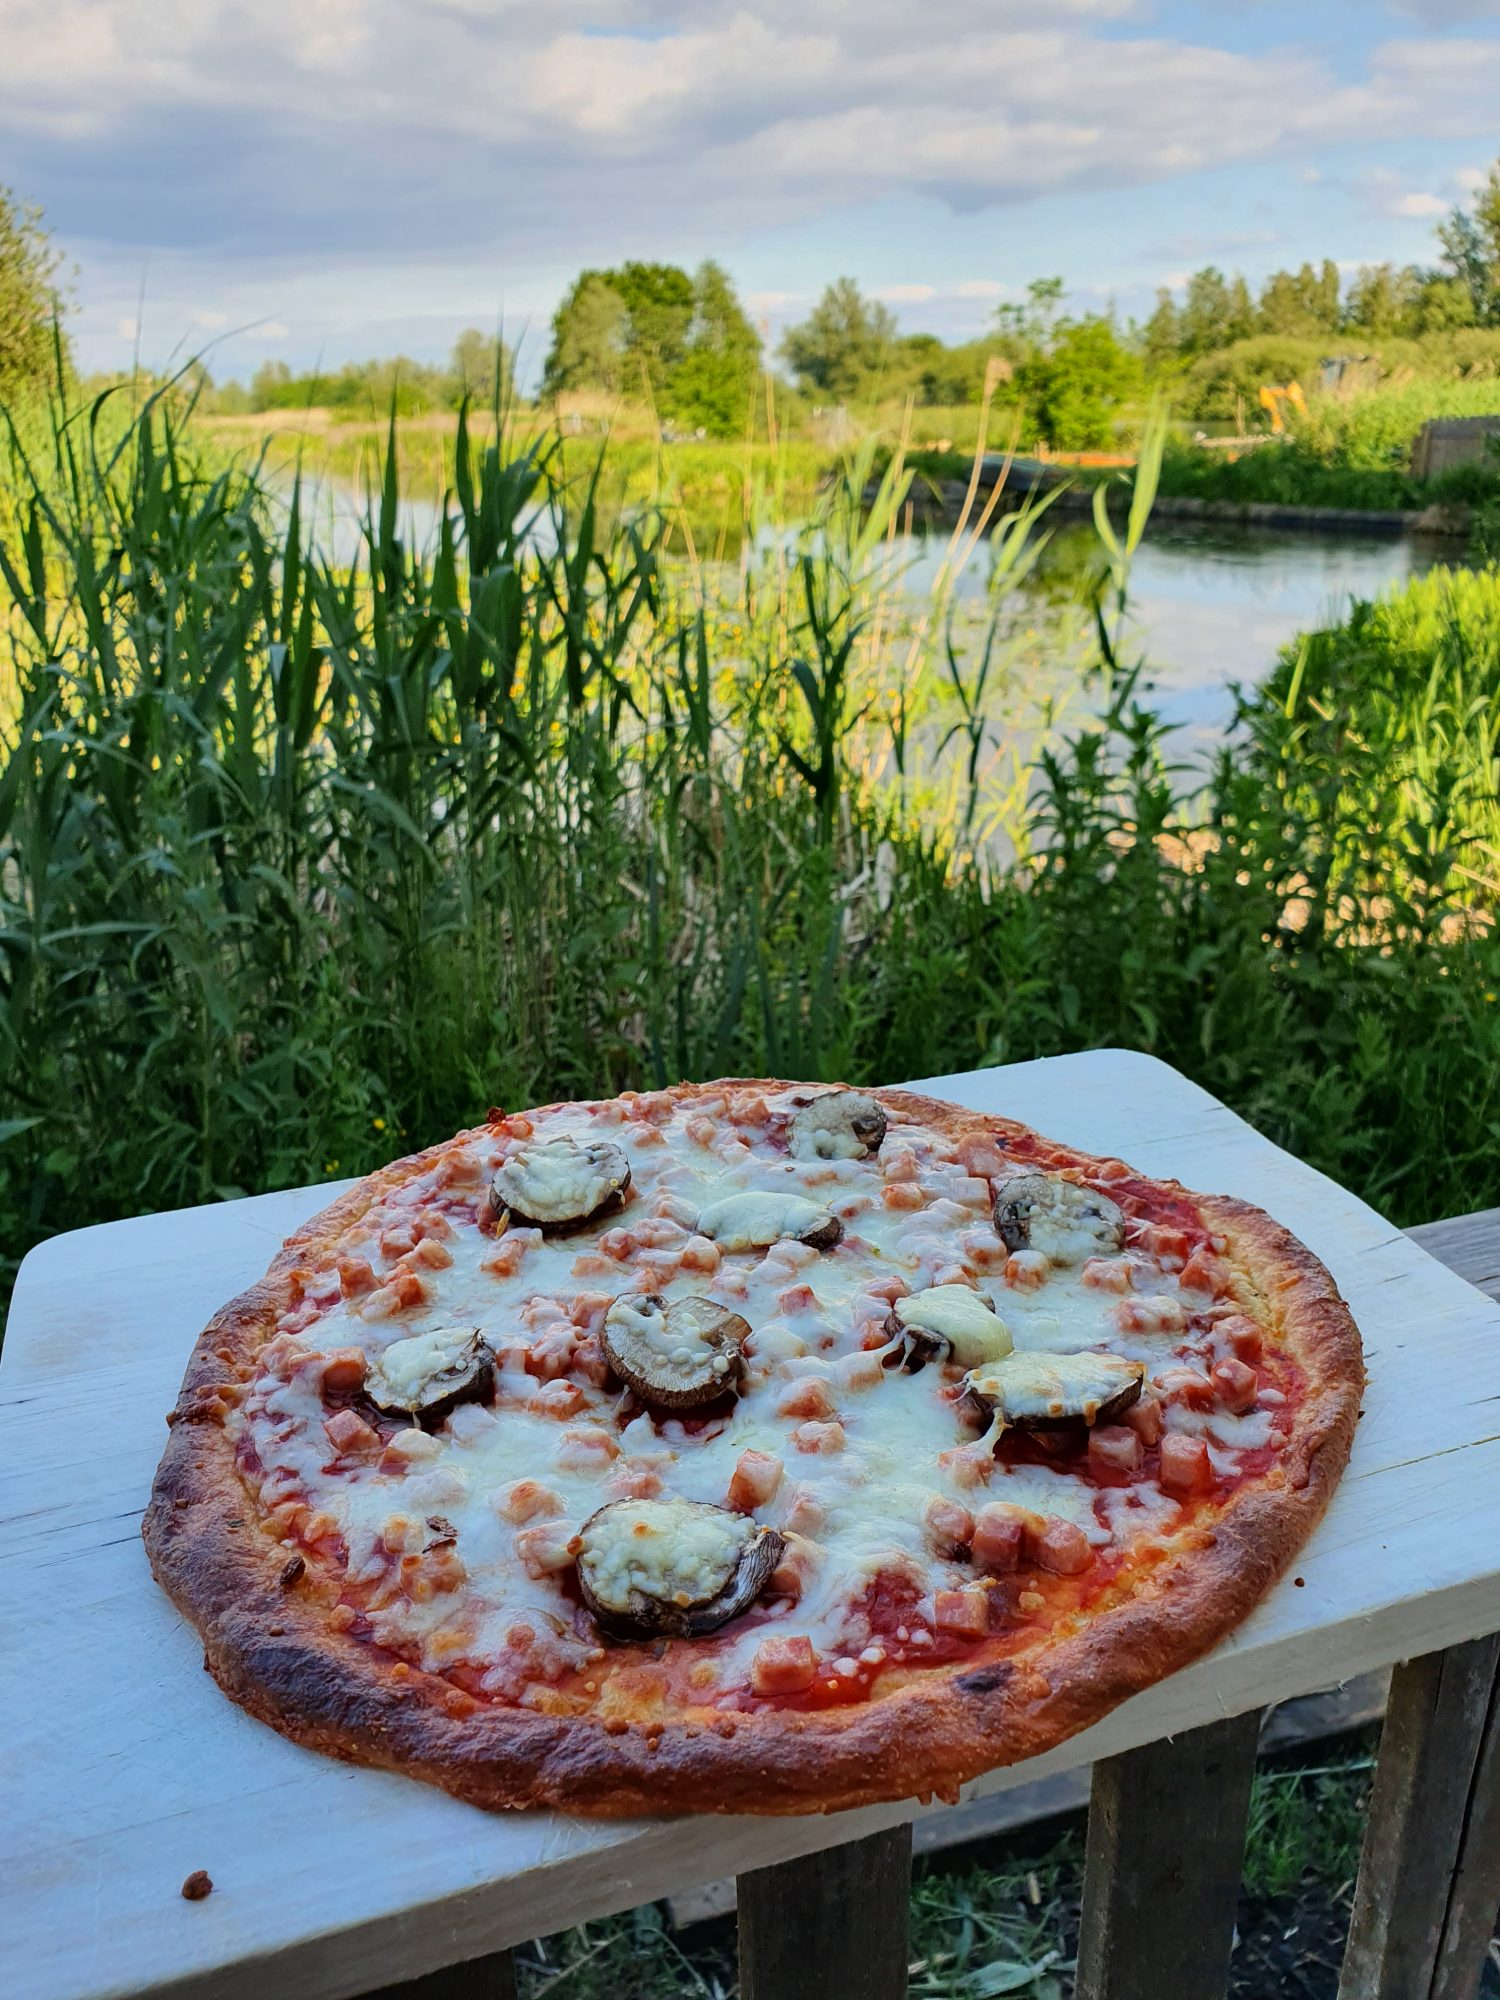 Keto Pizza   Mushroom & cheese